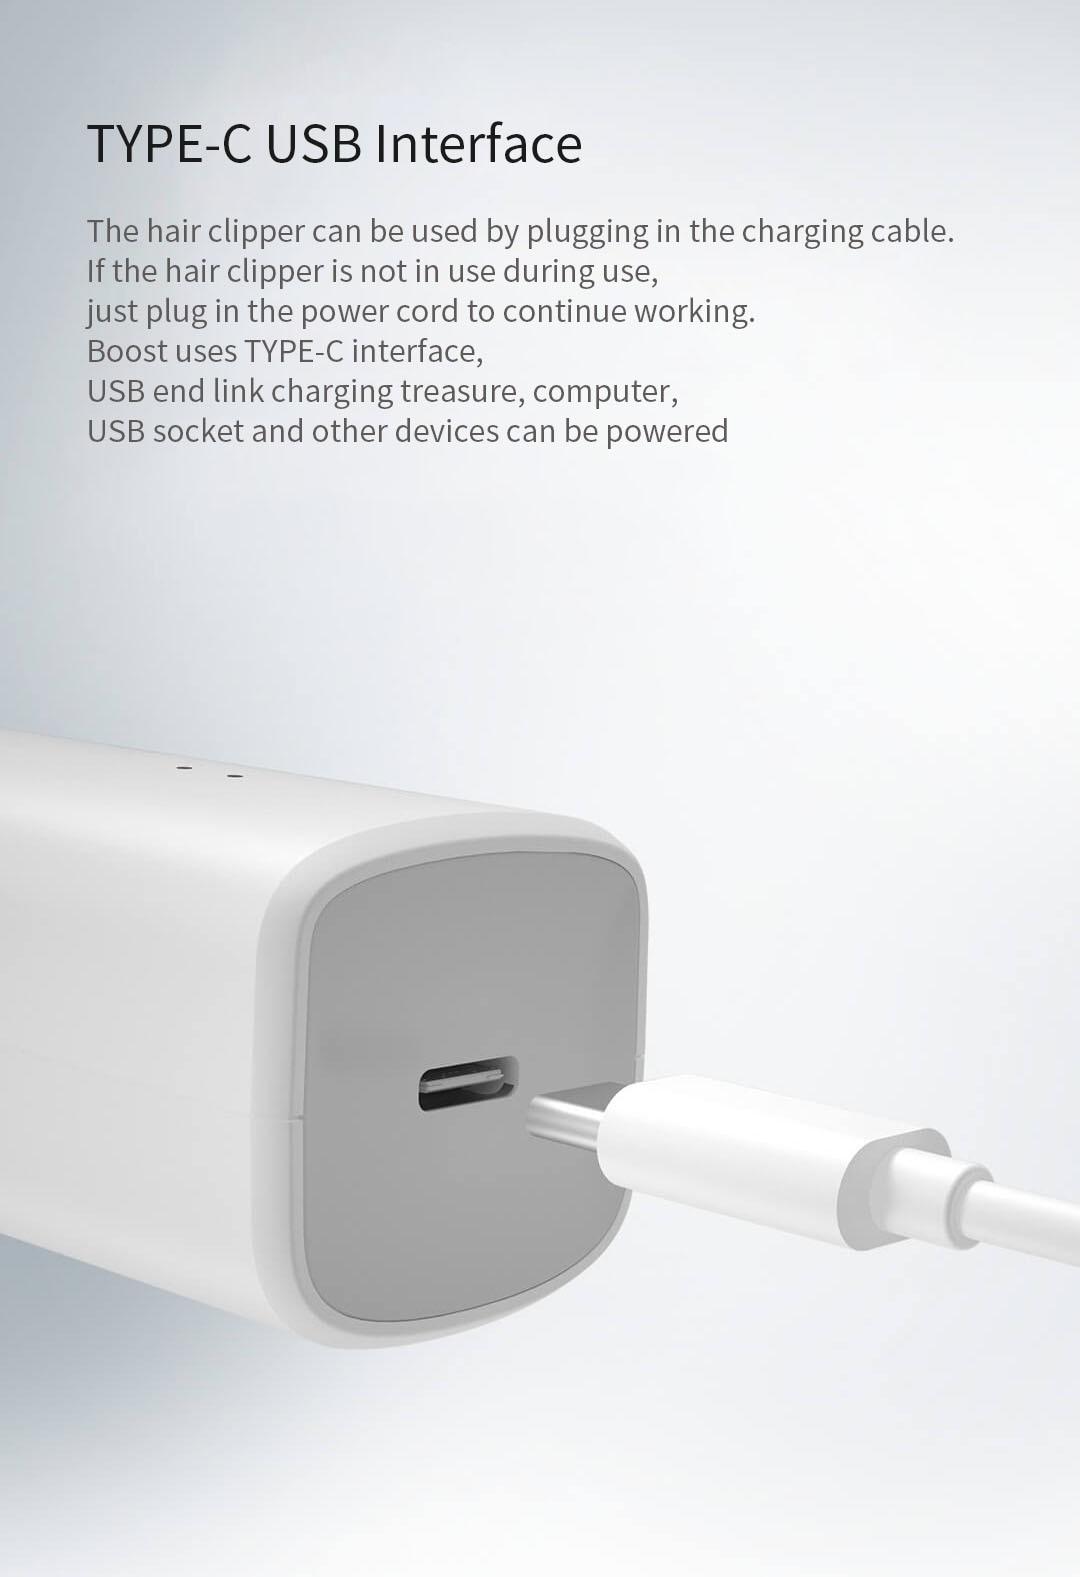 Xiaomi ENCHEN Boost USB Electric Hair Clipper Two Speed Ceramic Cutter Hair Fast Charging Hair Trimmer Children Hair Clipper 7